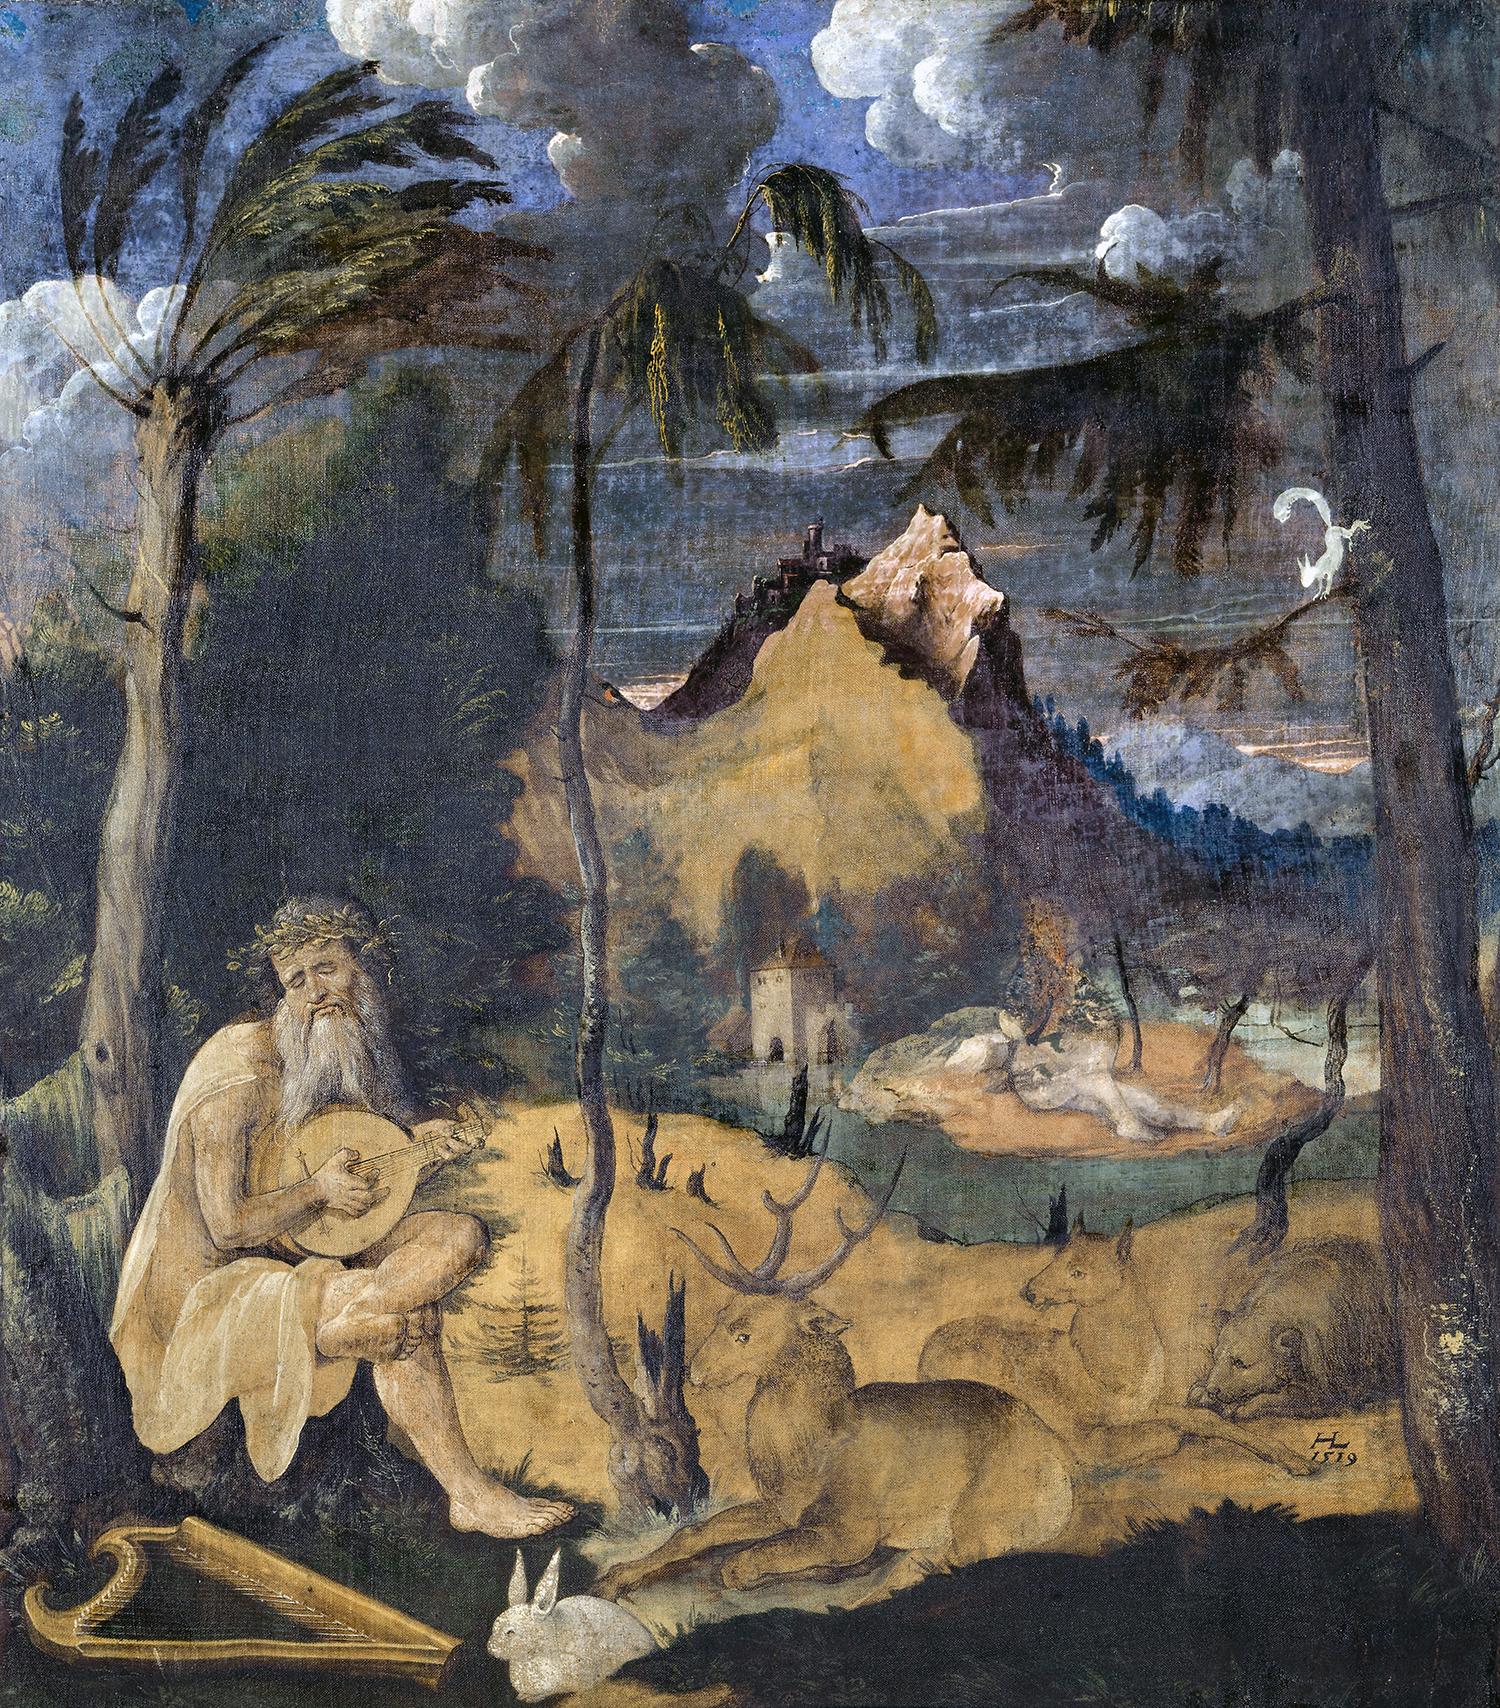 Orpheus und die Tiere, Hans Leu d. J., 1519, Kunstmuseum Basel